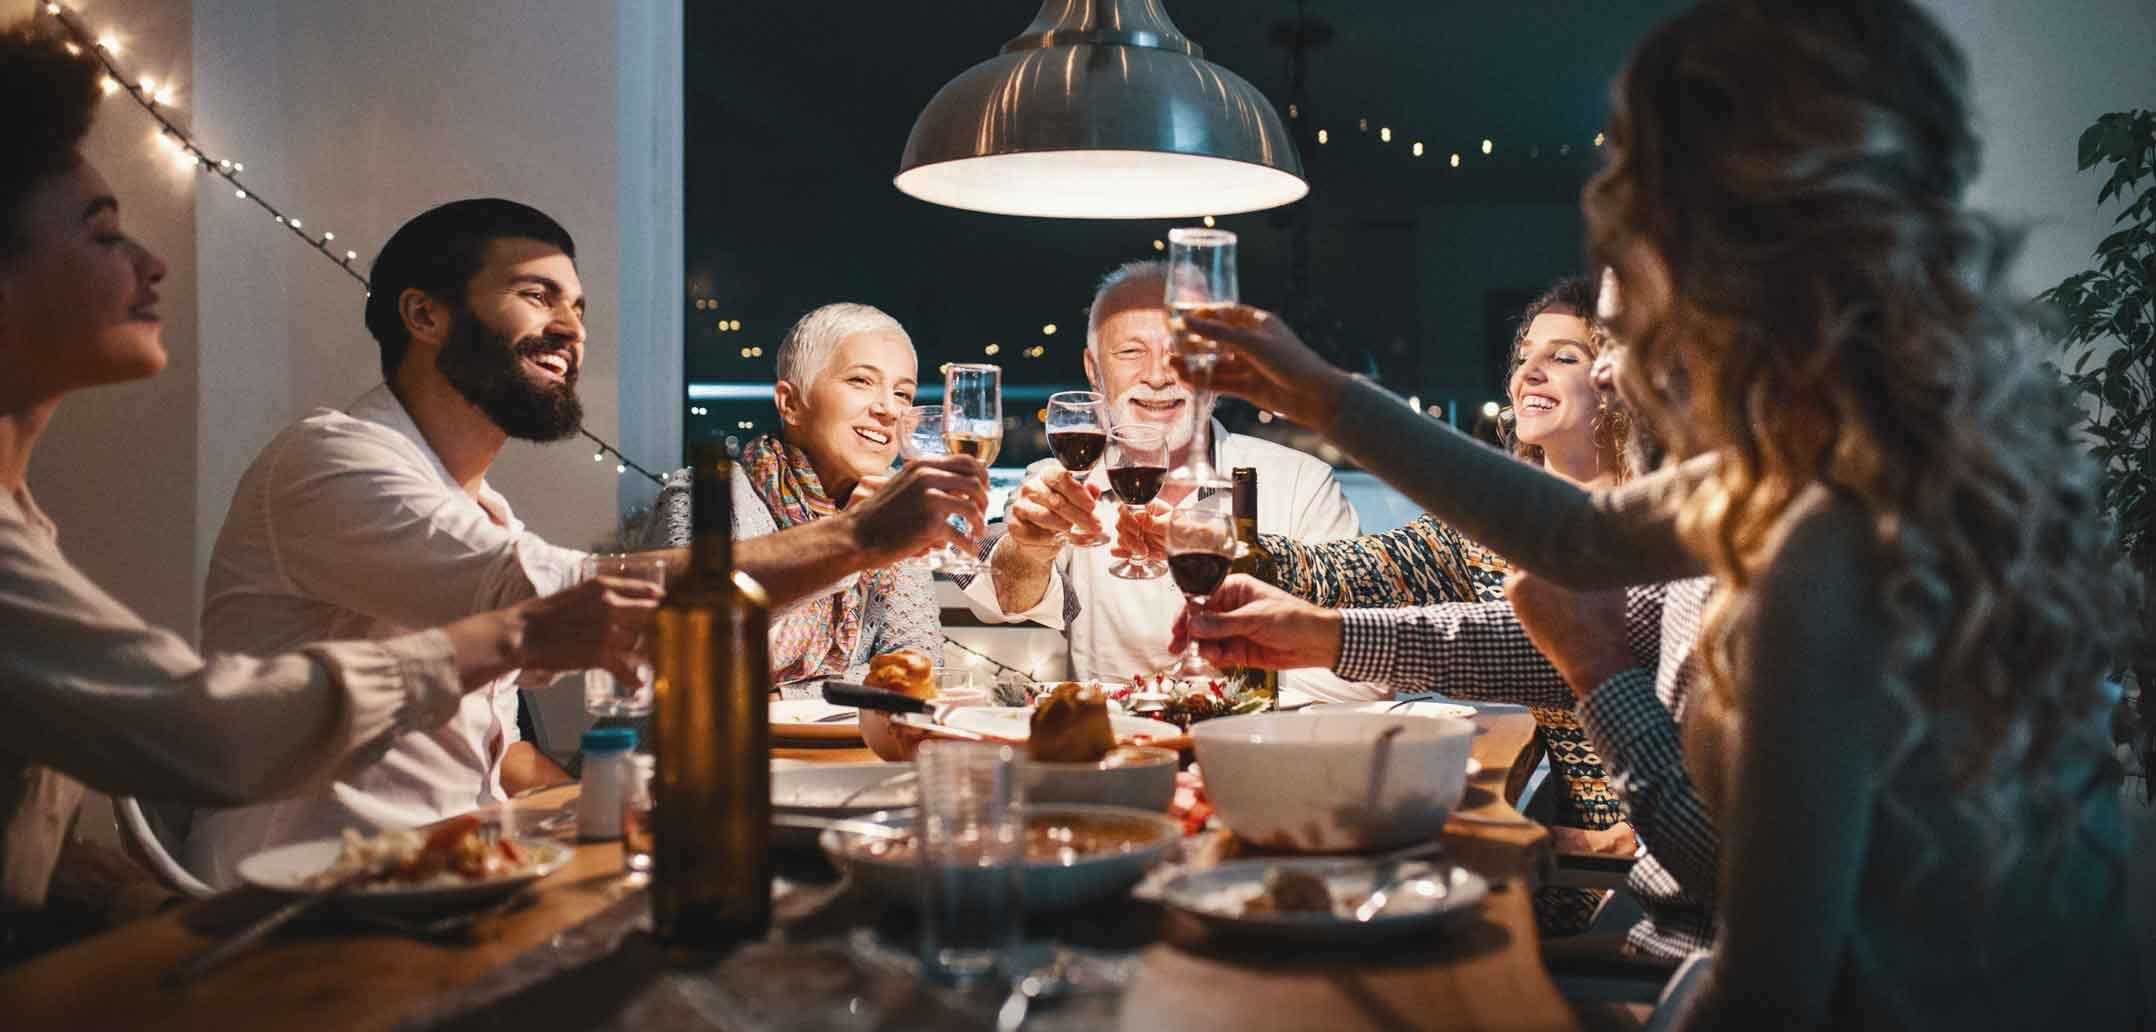 An Feiertagen kommt meist die ganze Familie an den Tisch